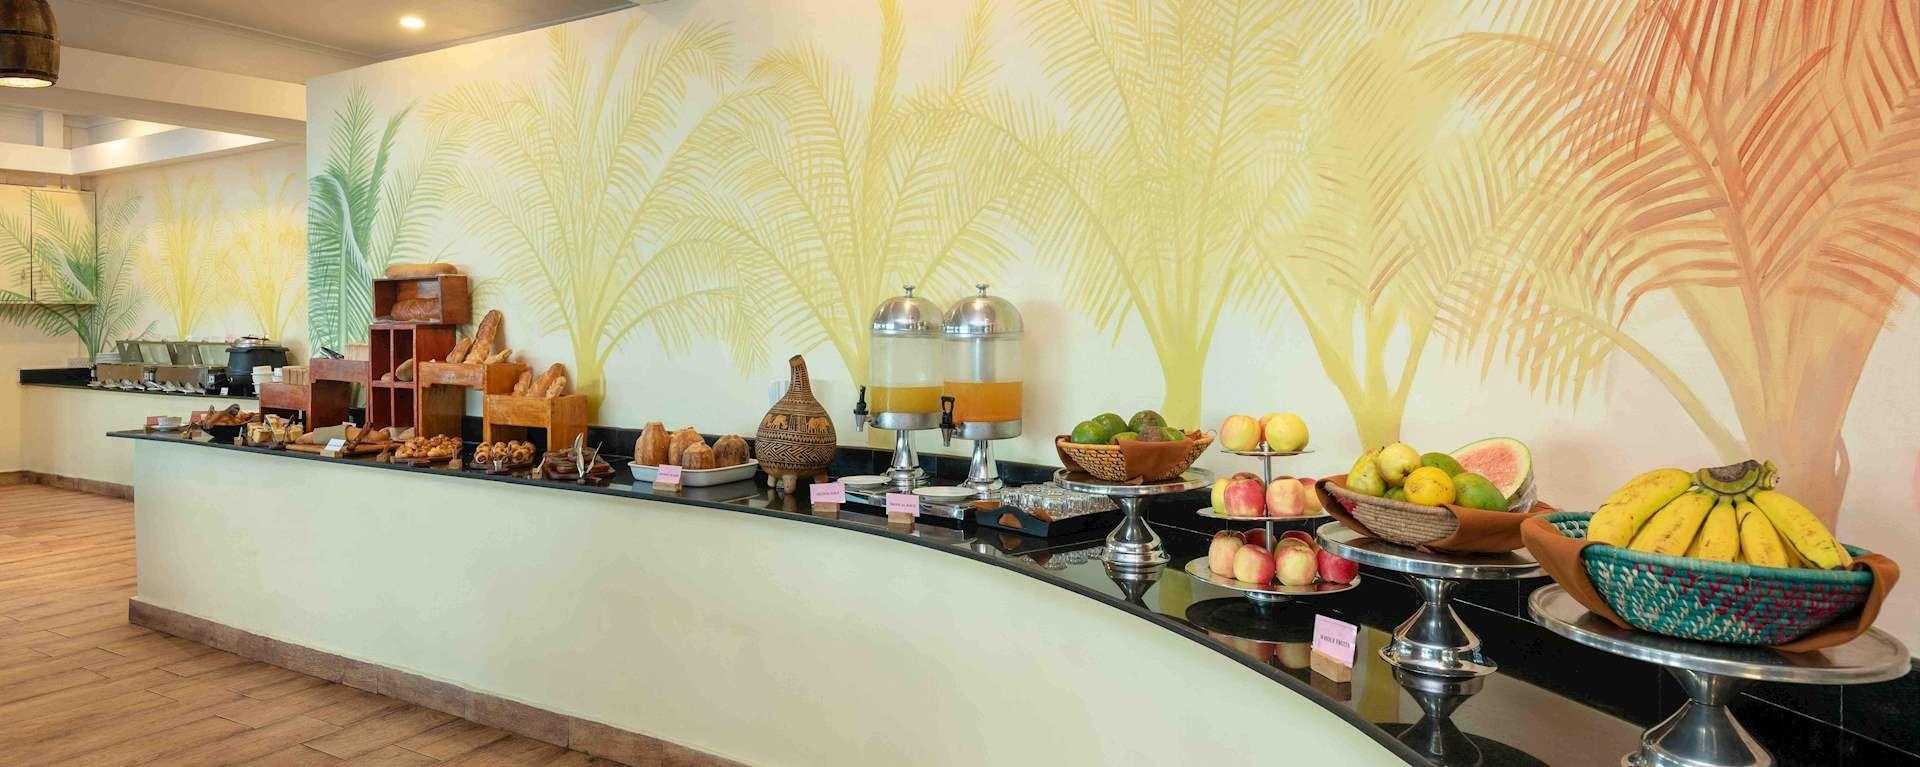 Best Western Coral Beach Hotel7